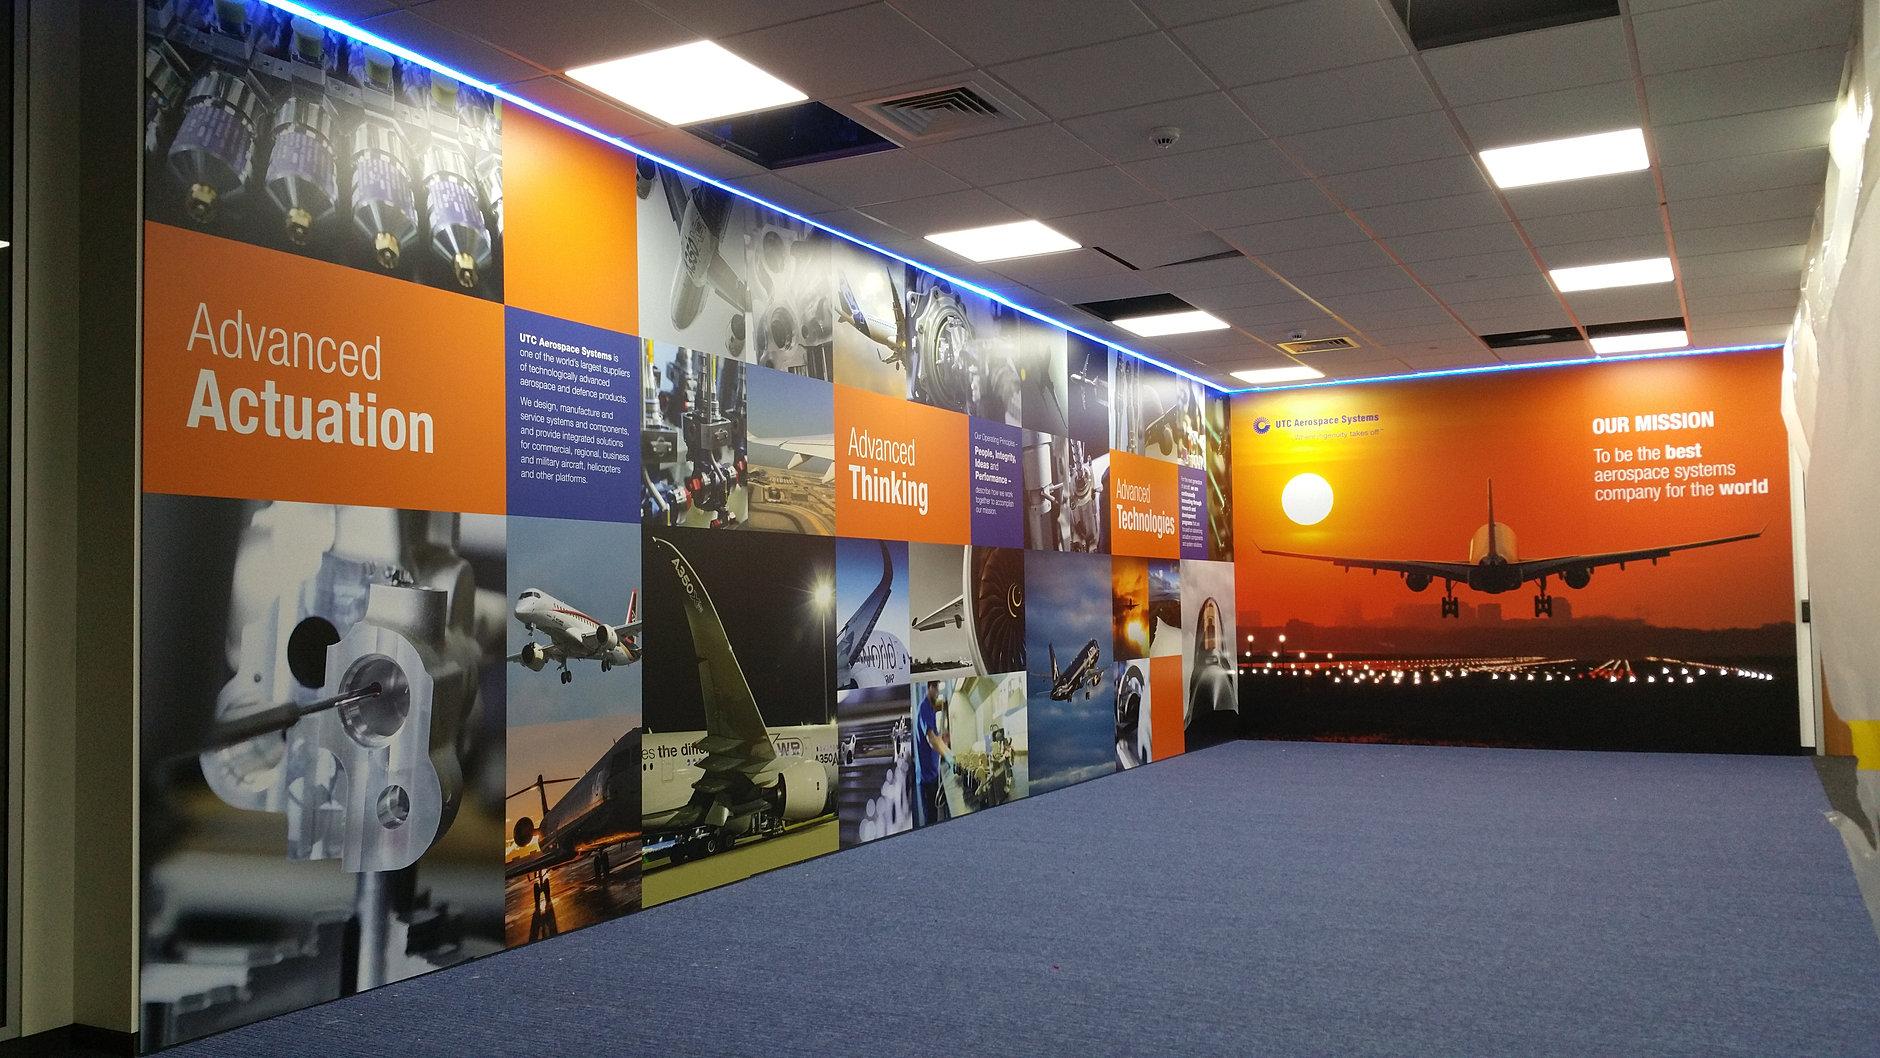 Wallscapers Ltd Birmingham Large Format Printing Services